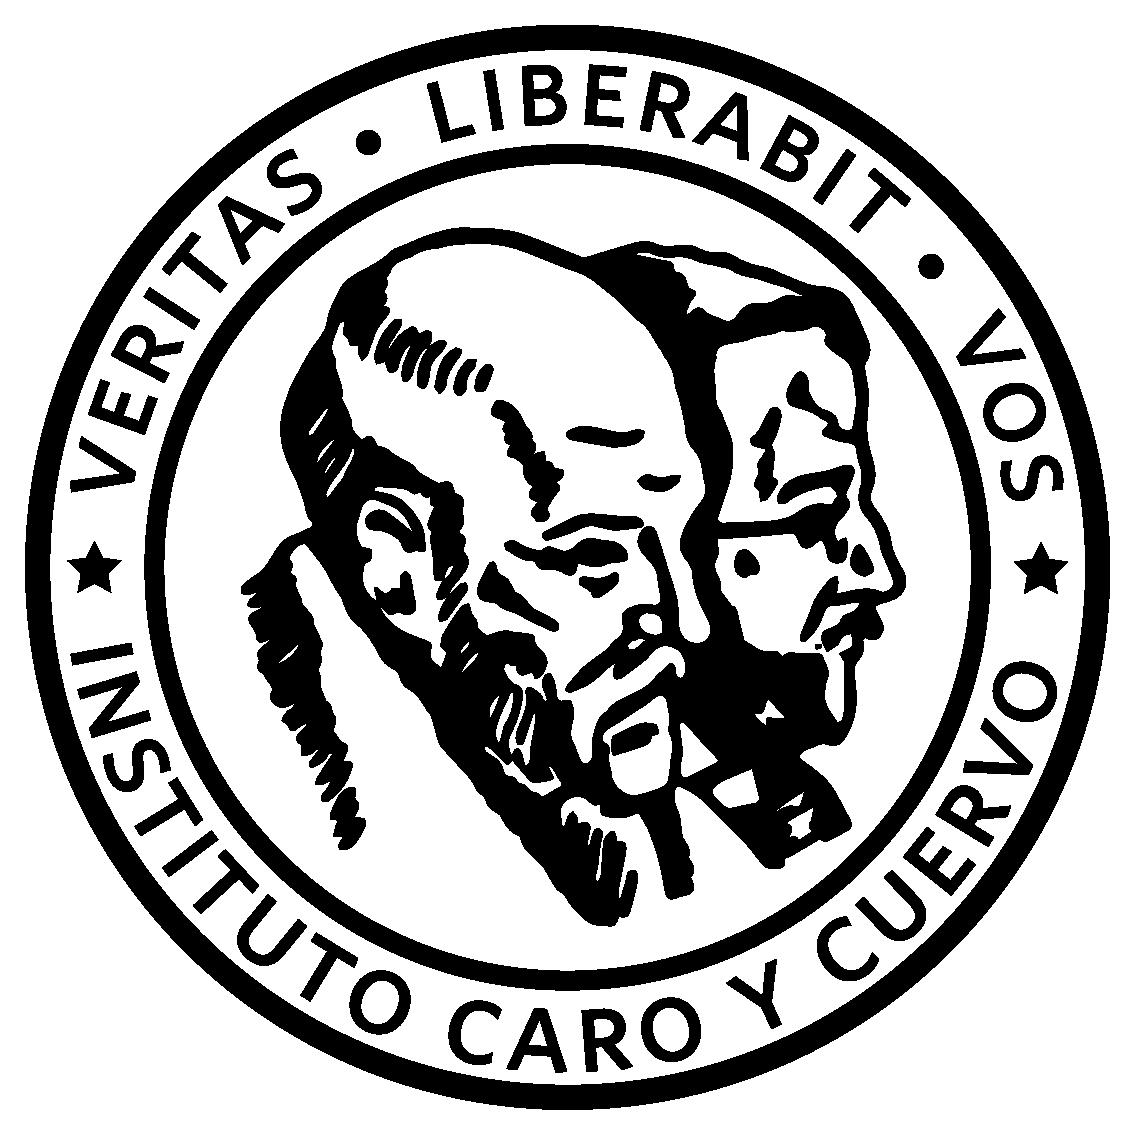 logo-instituo-caro-y-cuervo